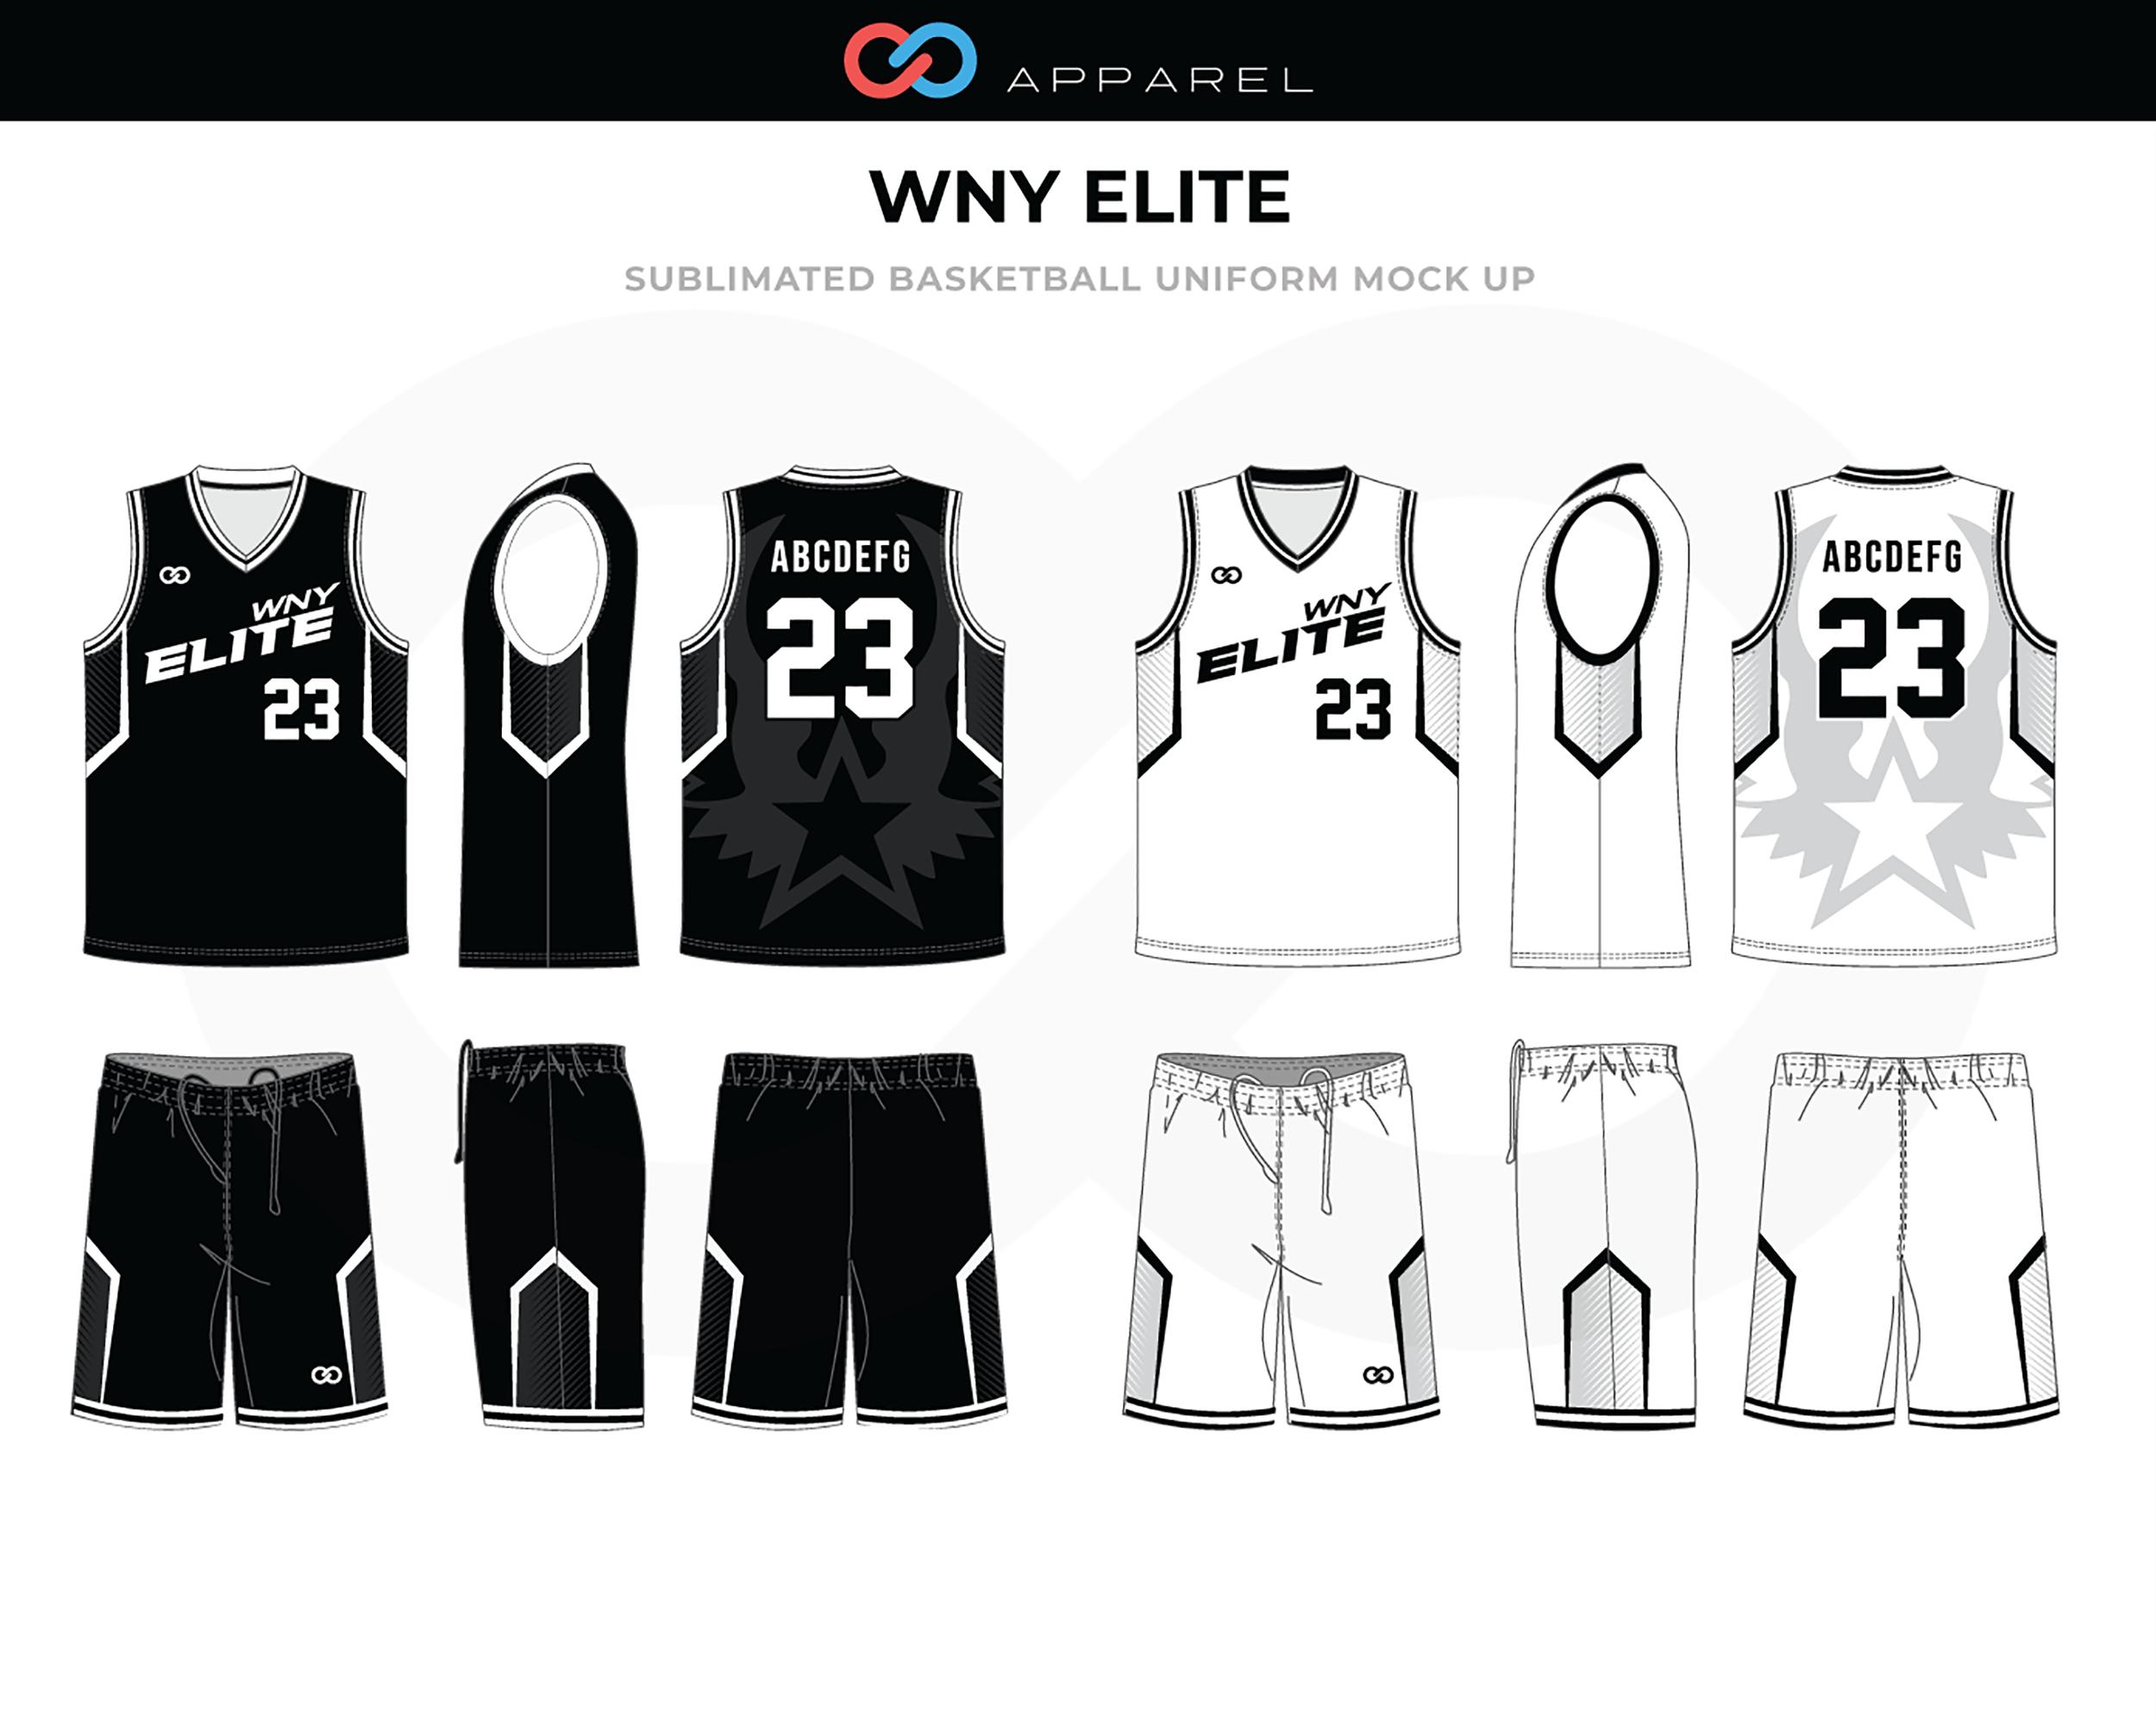 WNY ELITE Black White Basketball Uniform, Jersey and Shorts